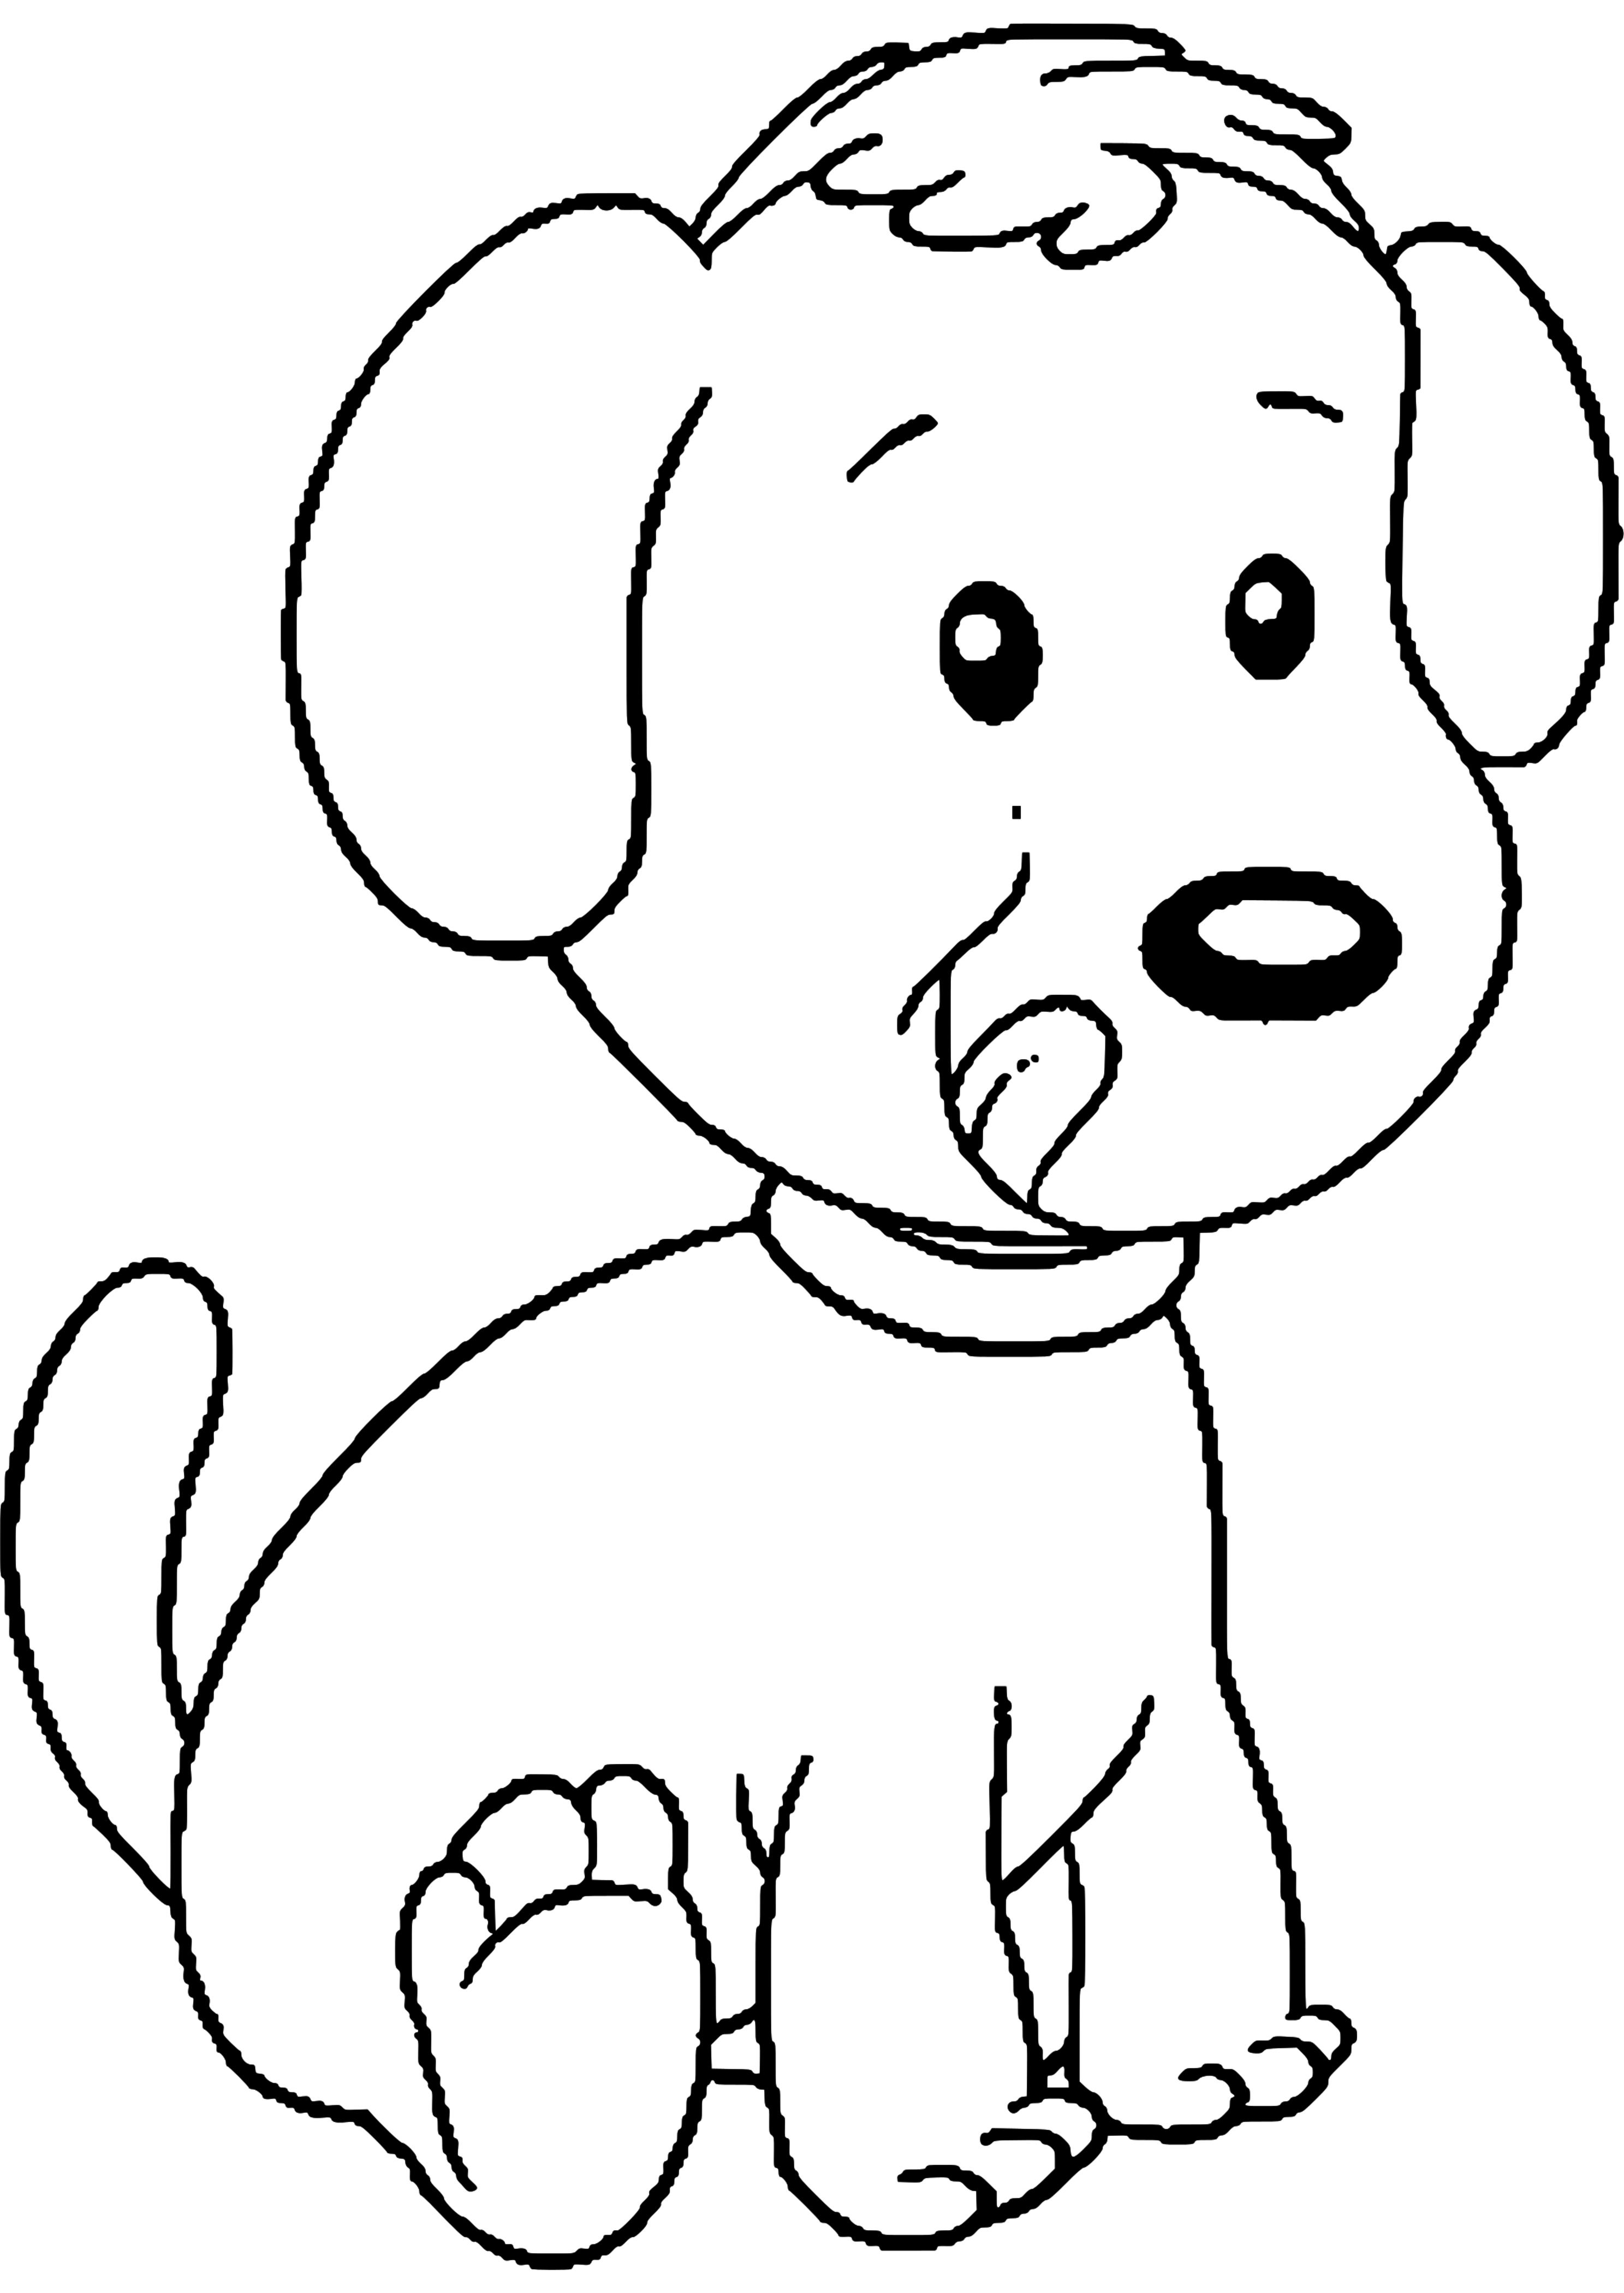 Ausmalbilder Tiere Wiese   Dog coloring page, Puppy ...